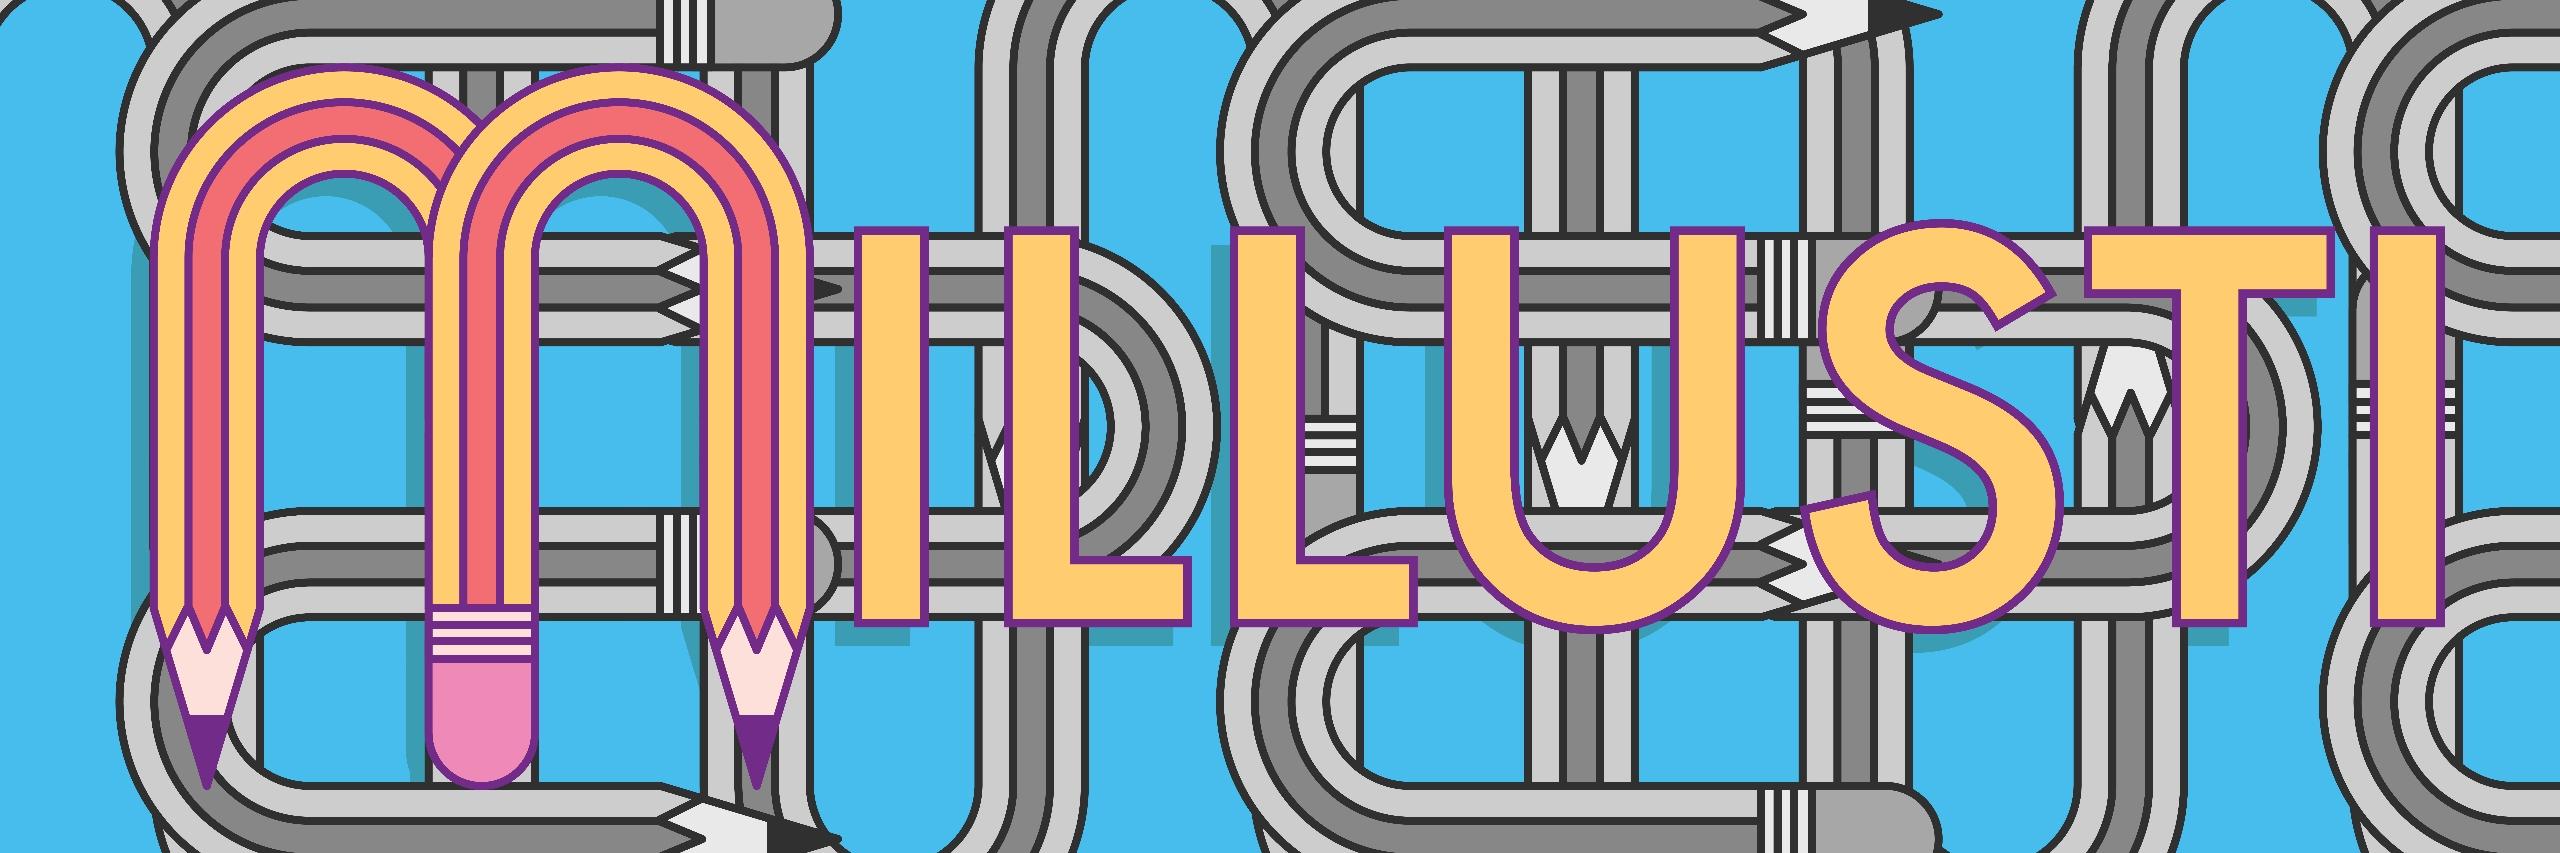 Millusti (@millusti) Cover Image